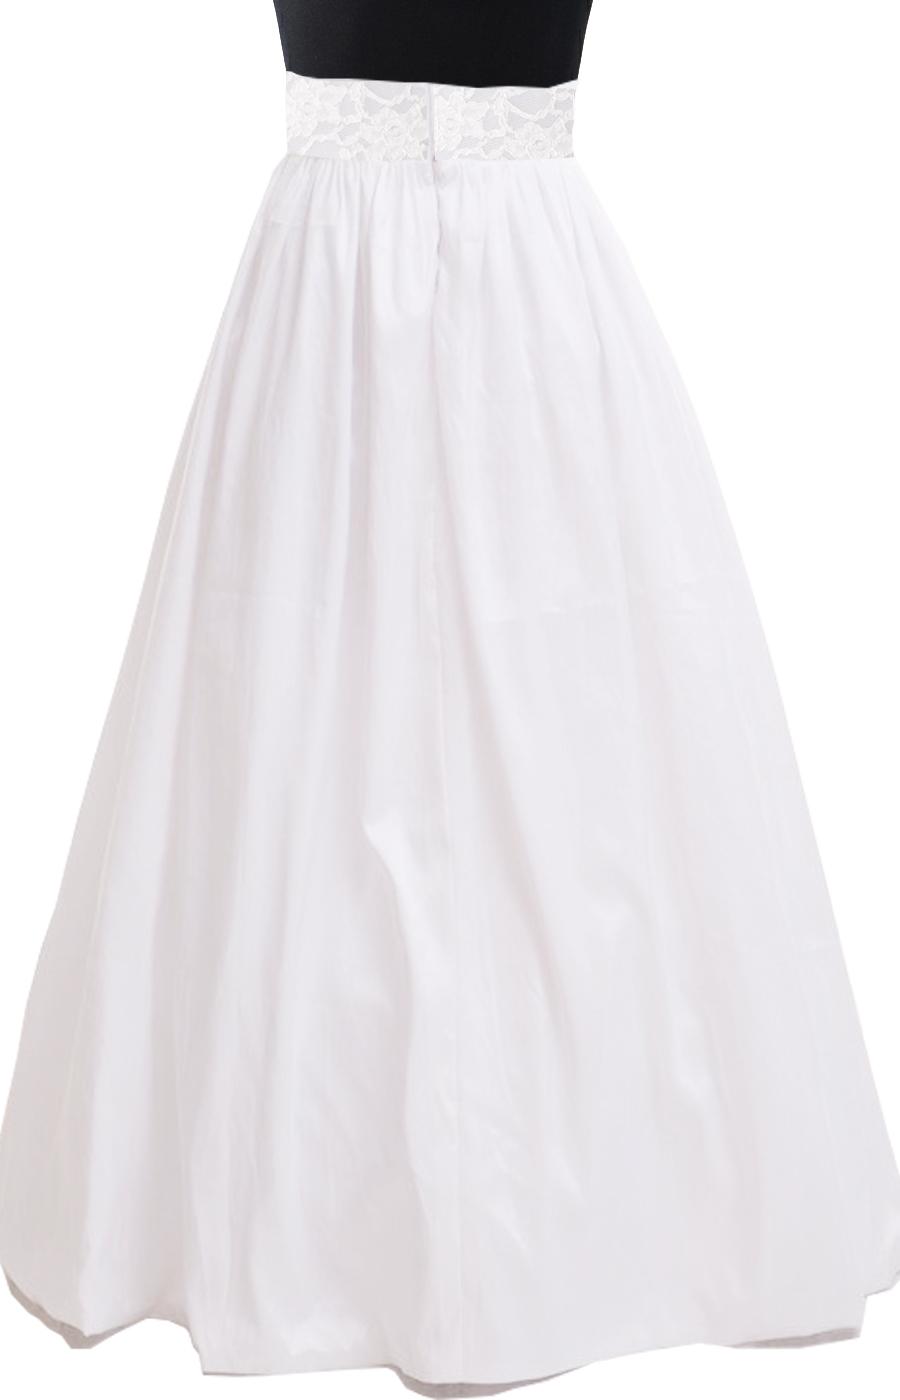 White Taffeta Maxi Skirt Elizabeth S Custom Skirts